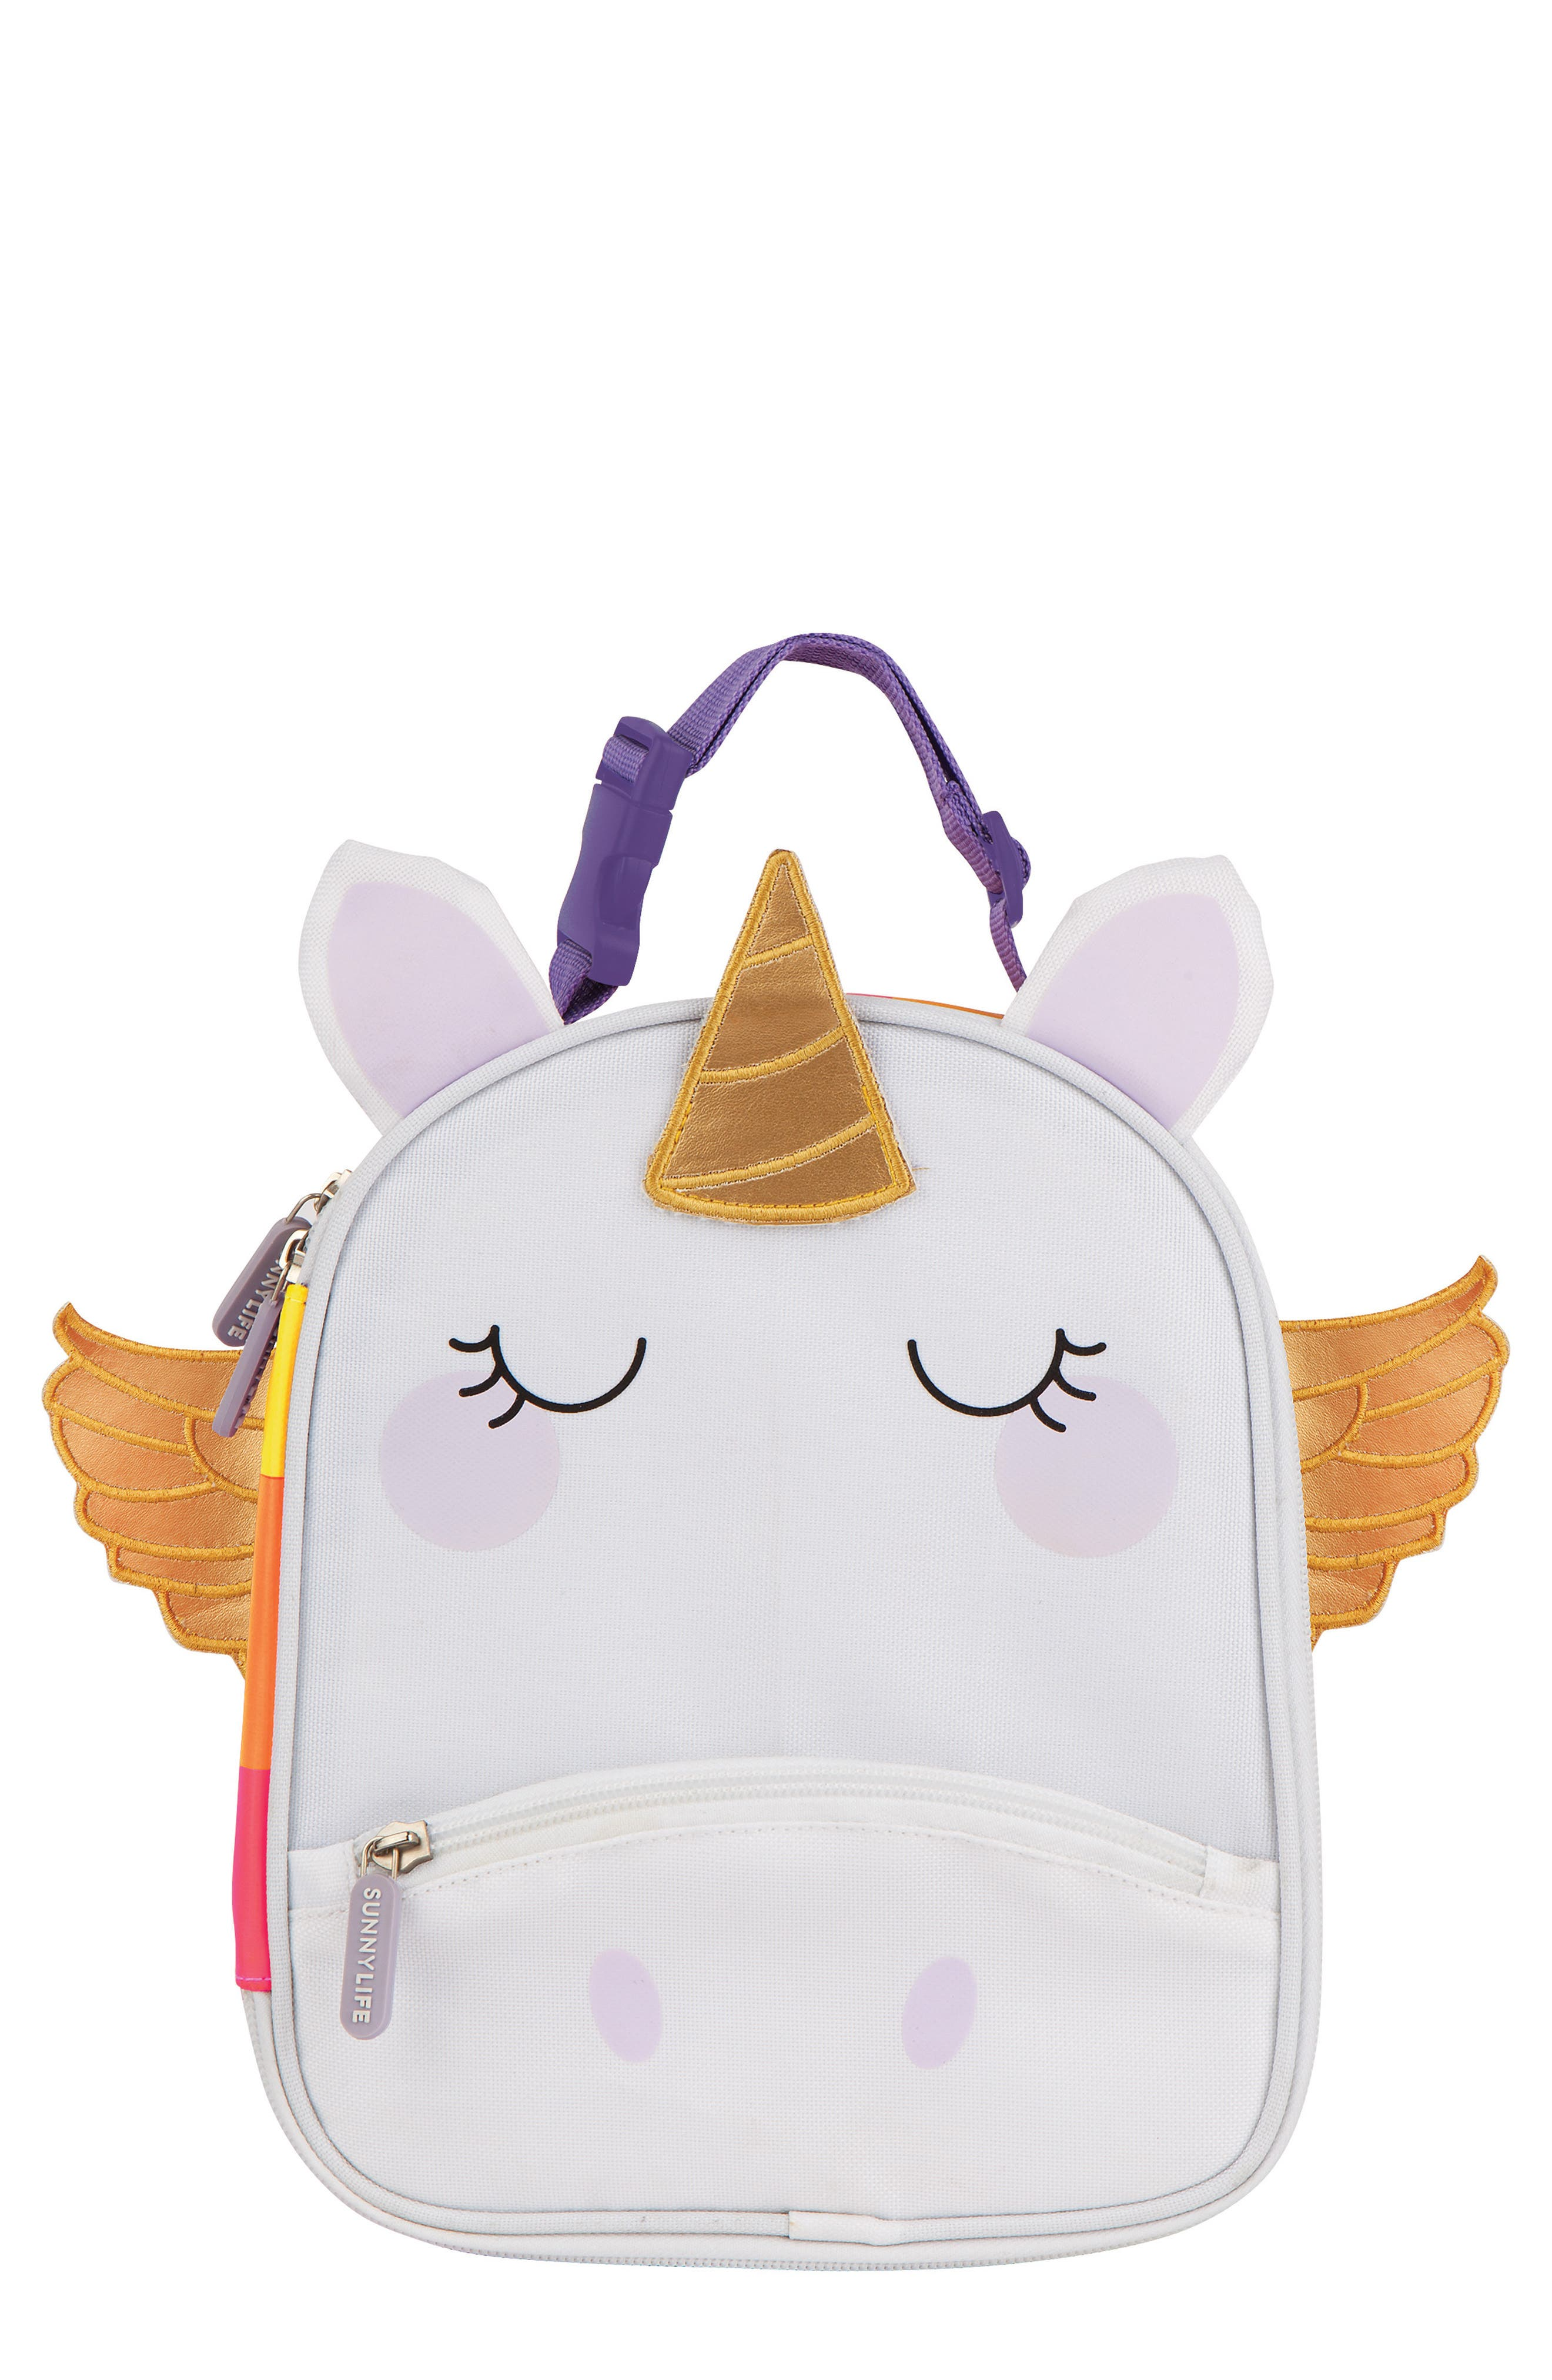 Girls Sunnylife Unicorn Lunch Bag  None